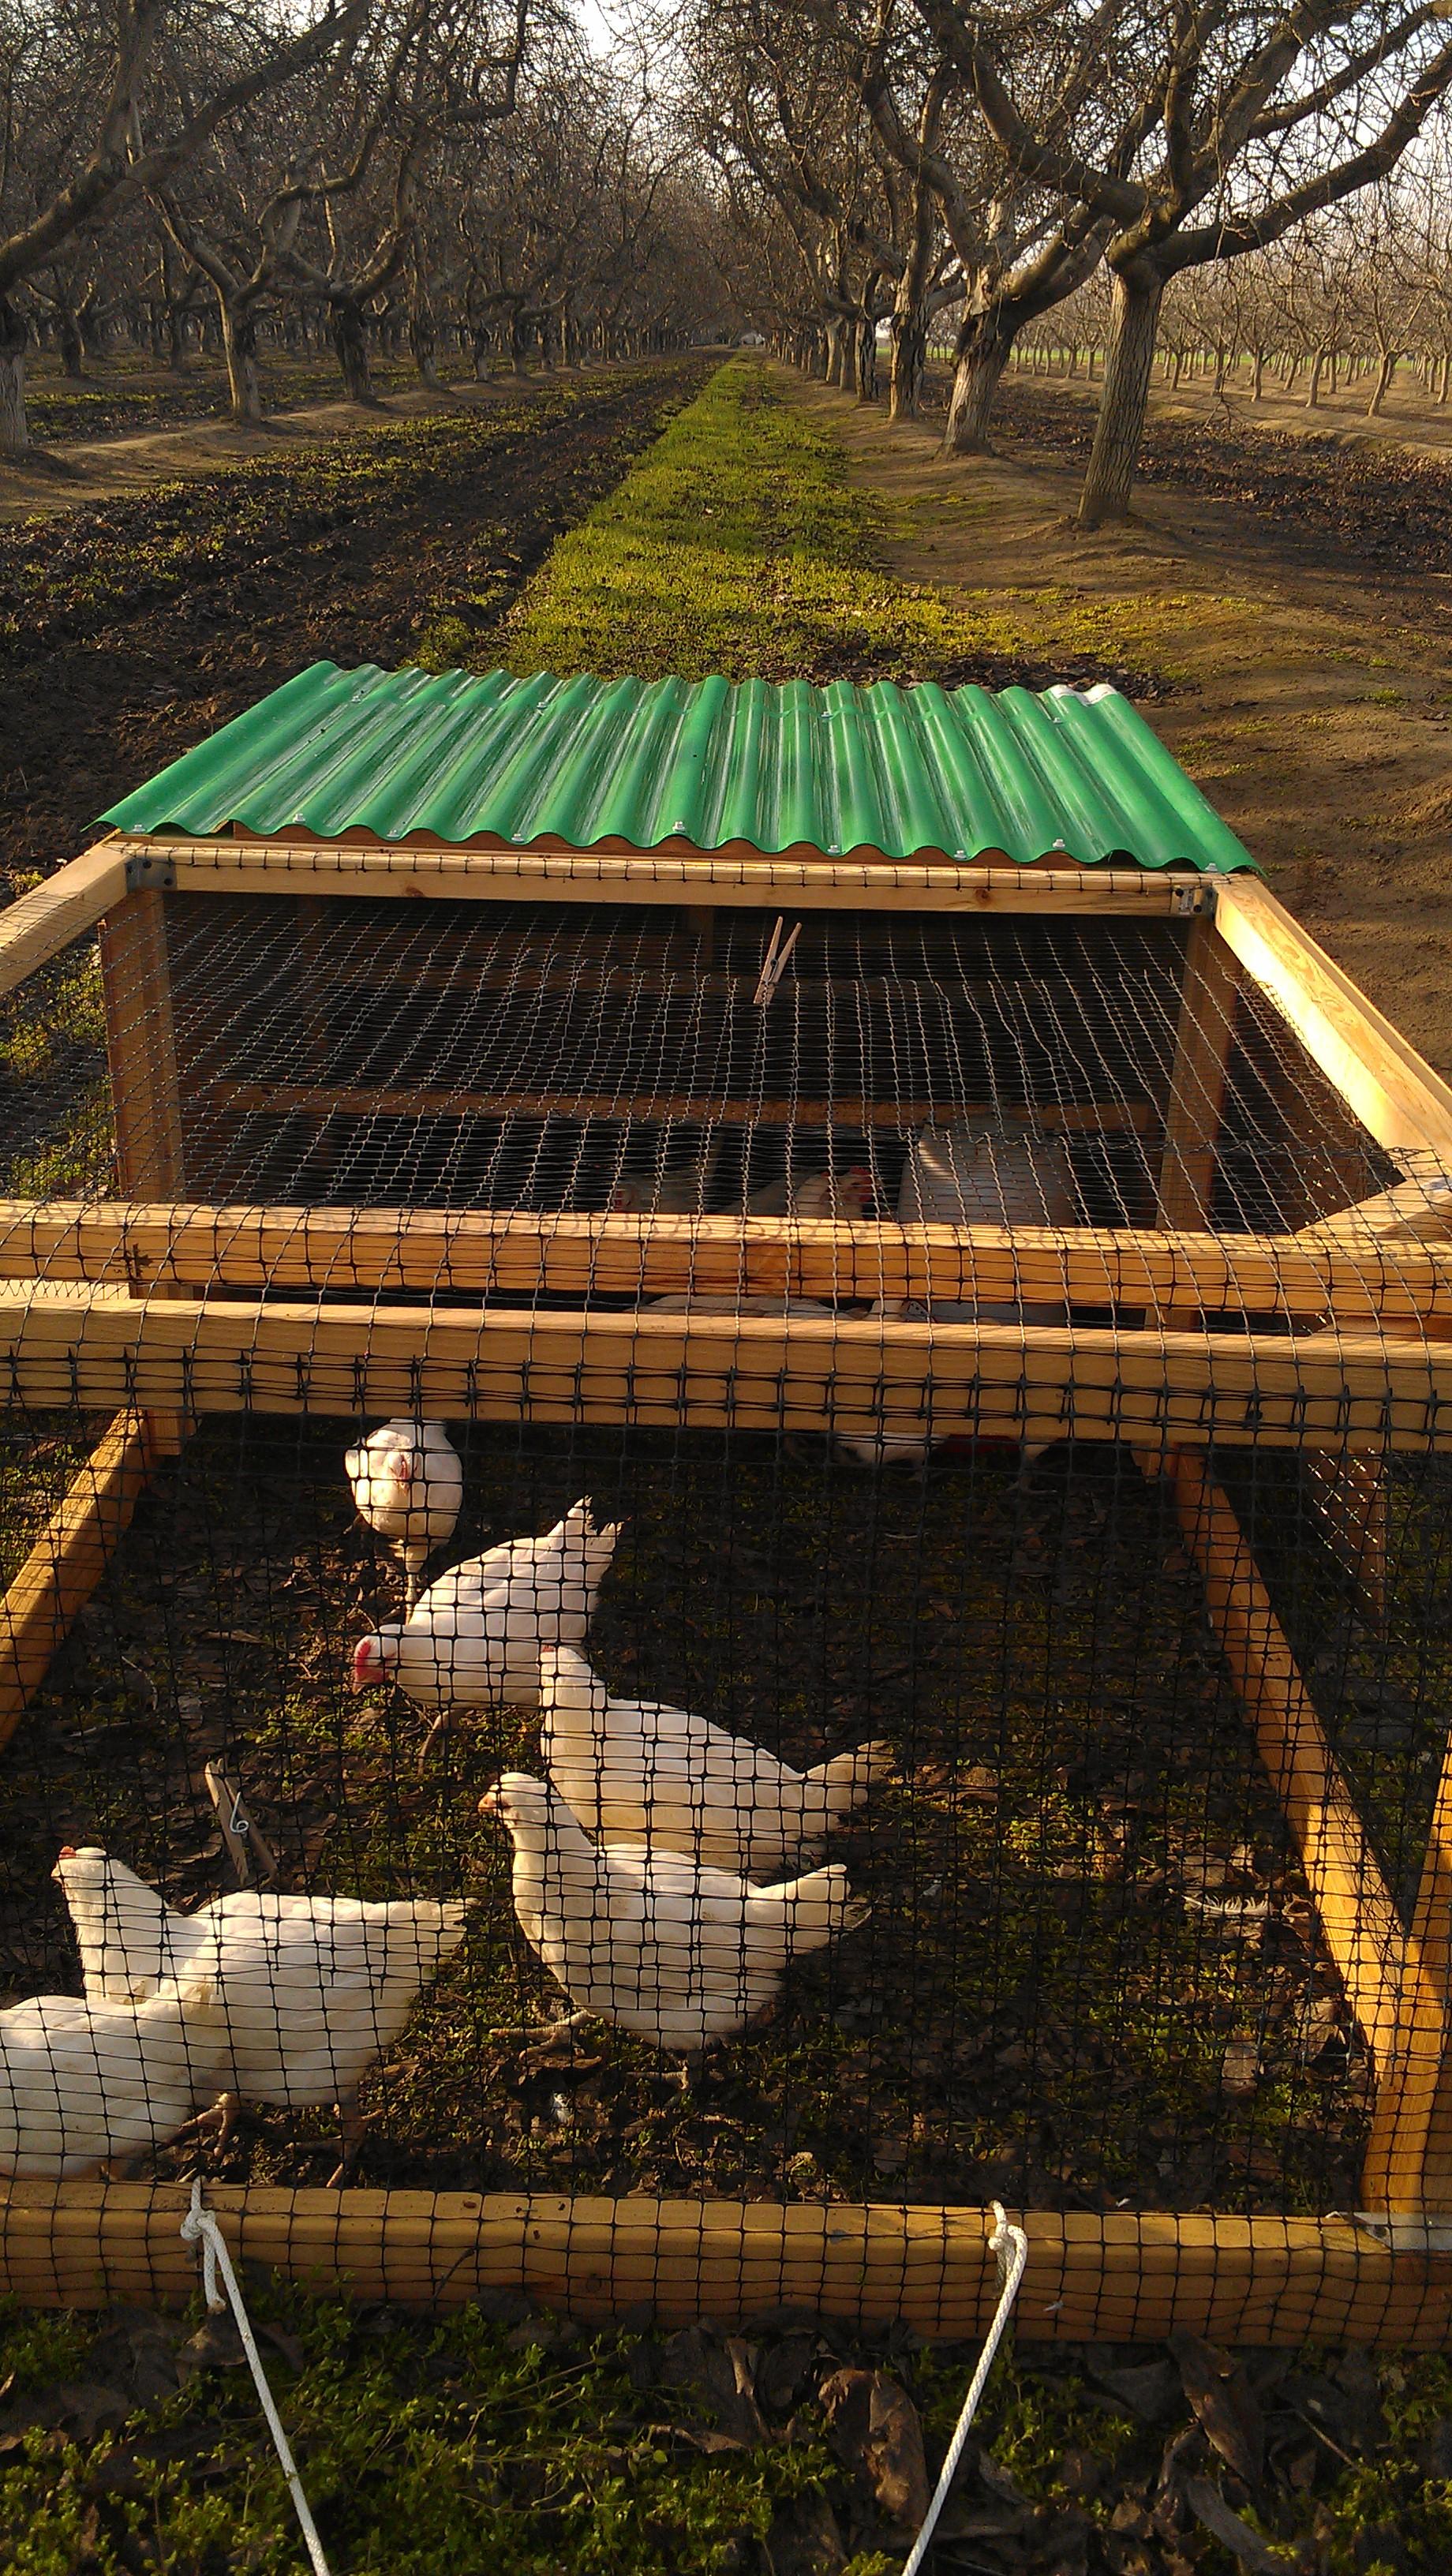 American Bresse Adventures - Sunbird Farms